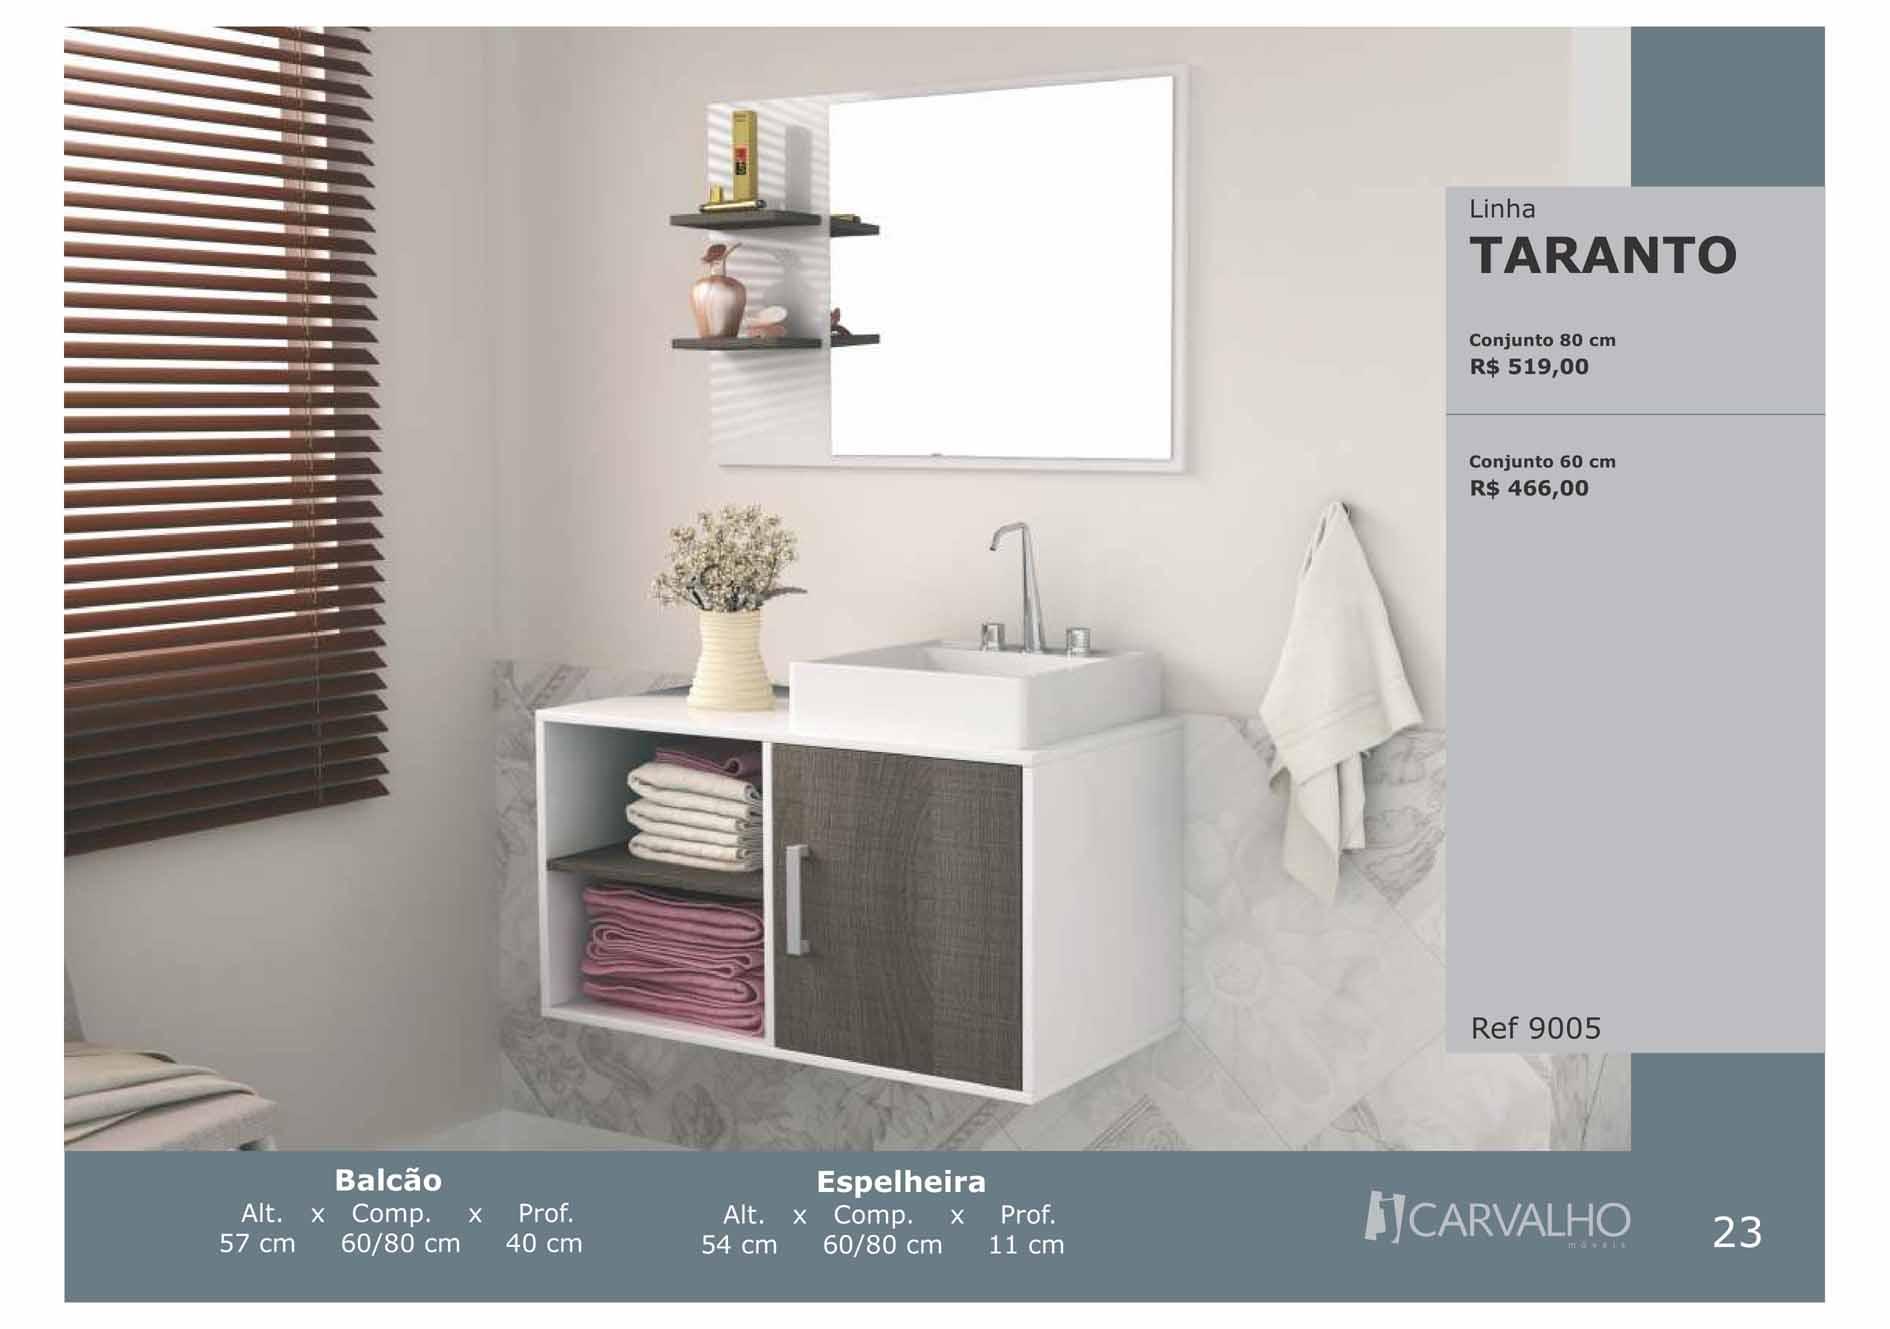 Taranto – Ref 9005